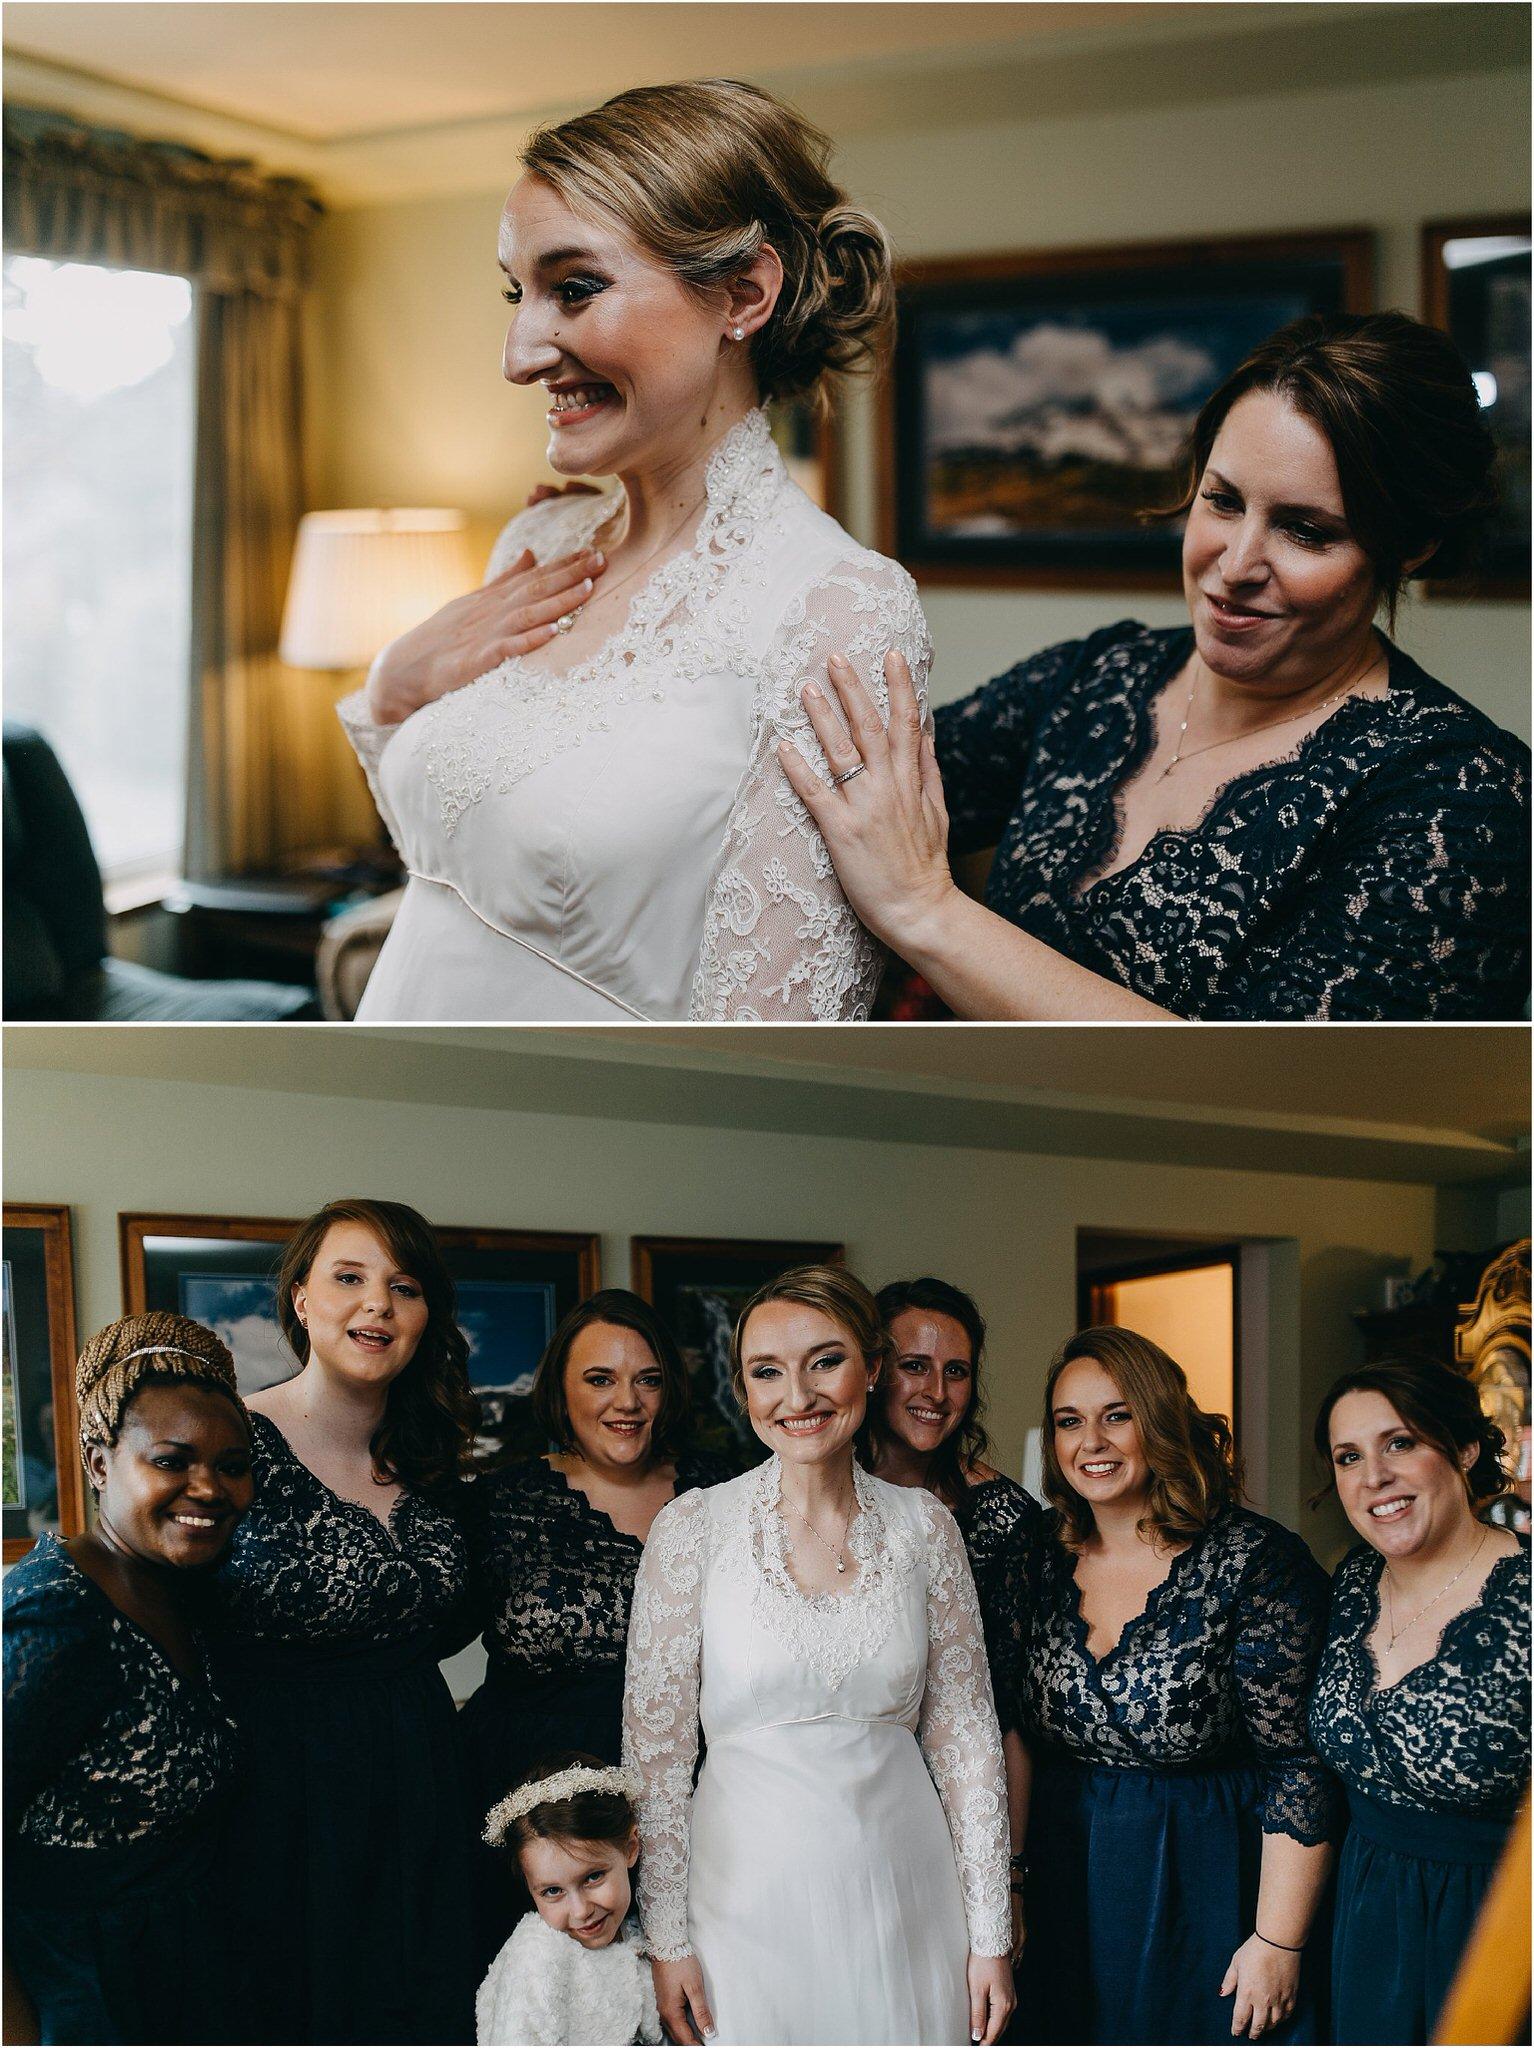 katy-robin-married-in-mukilteo-wedding12.jpg